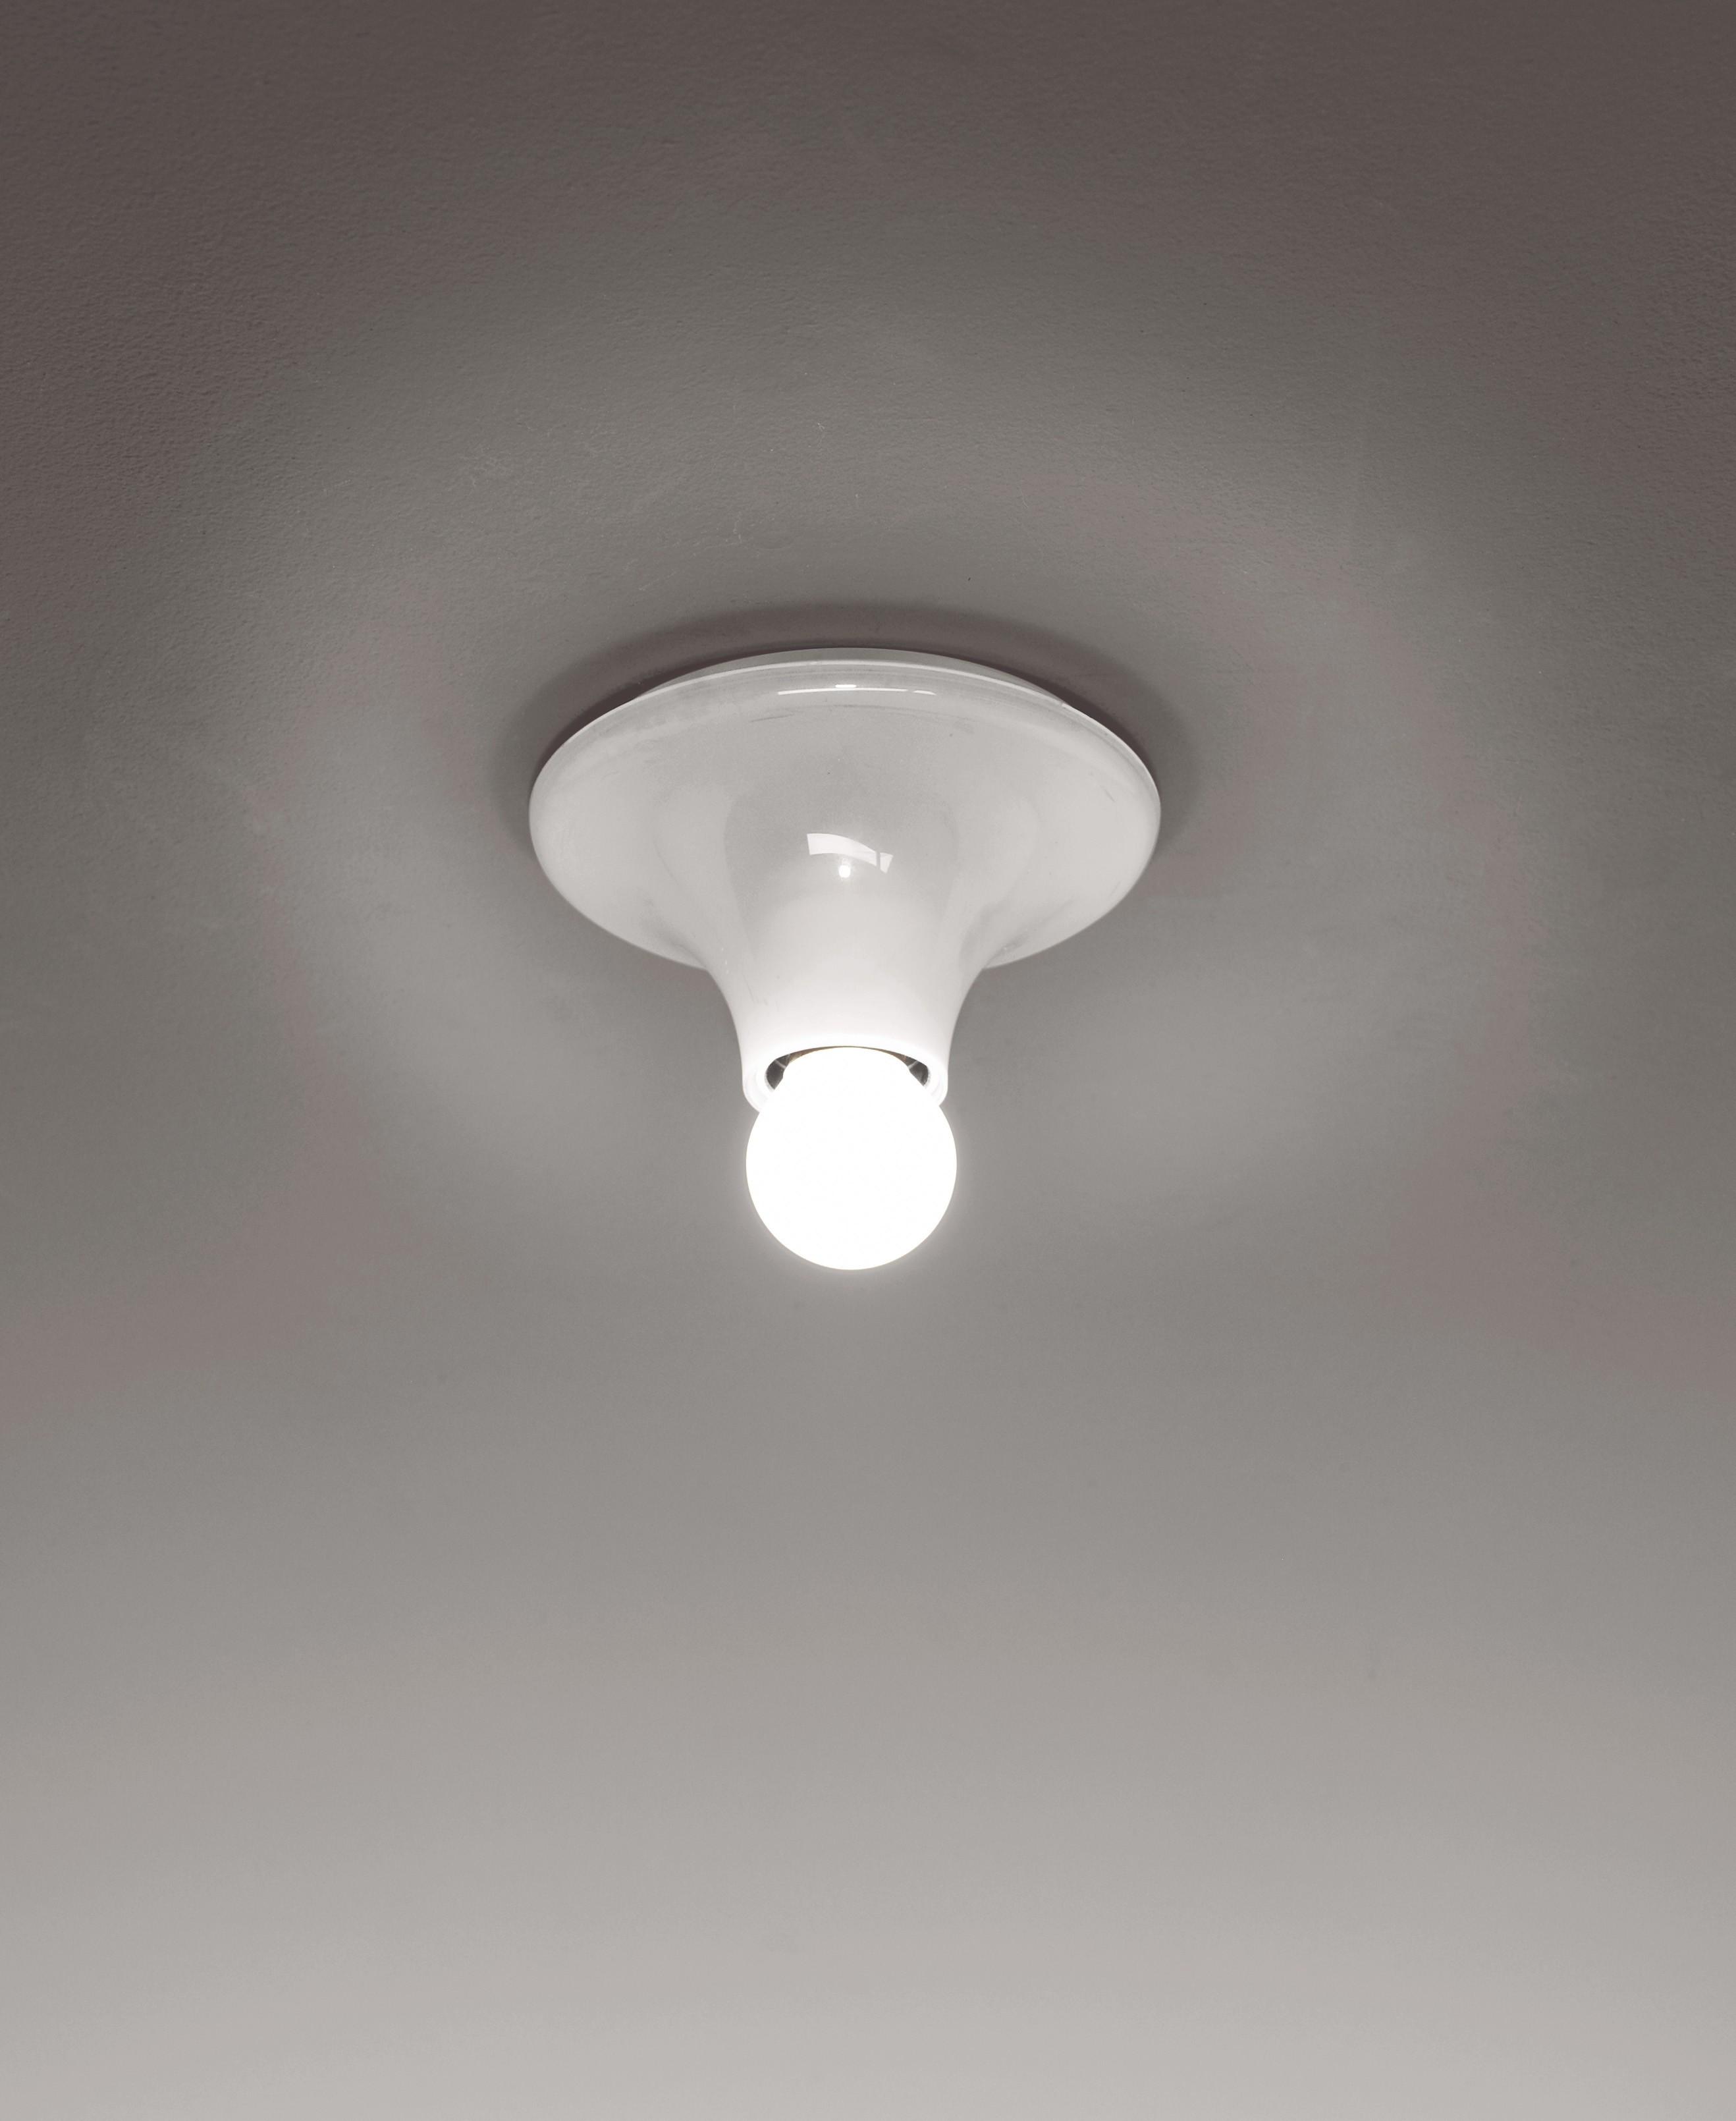 Prediger Lampen  Prediger Leuchten Berlin – Wohn design